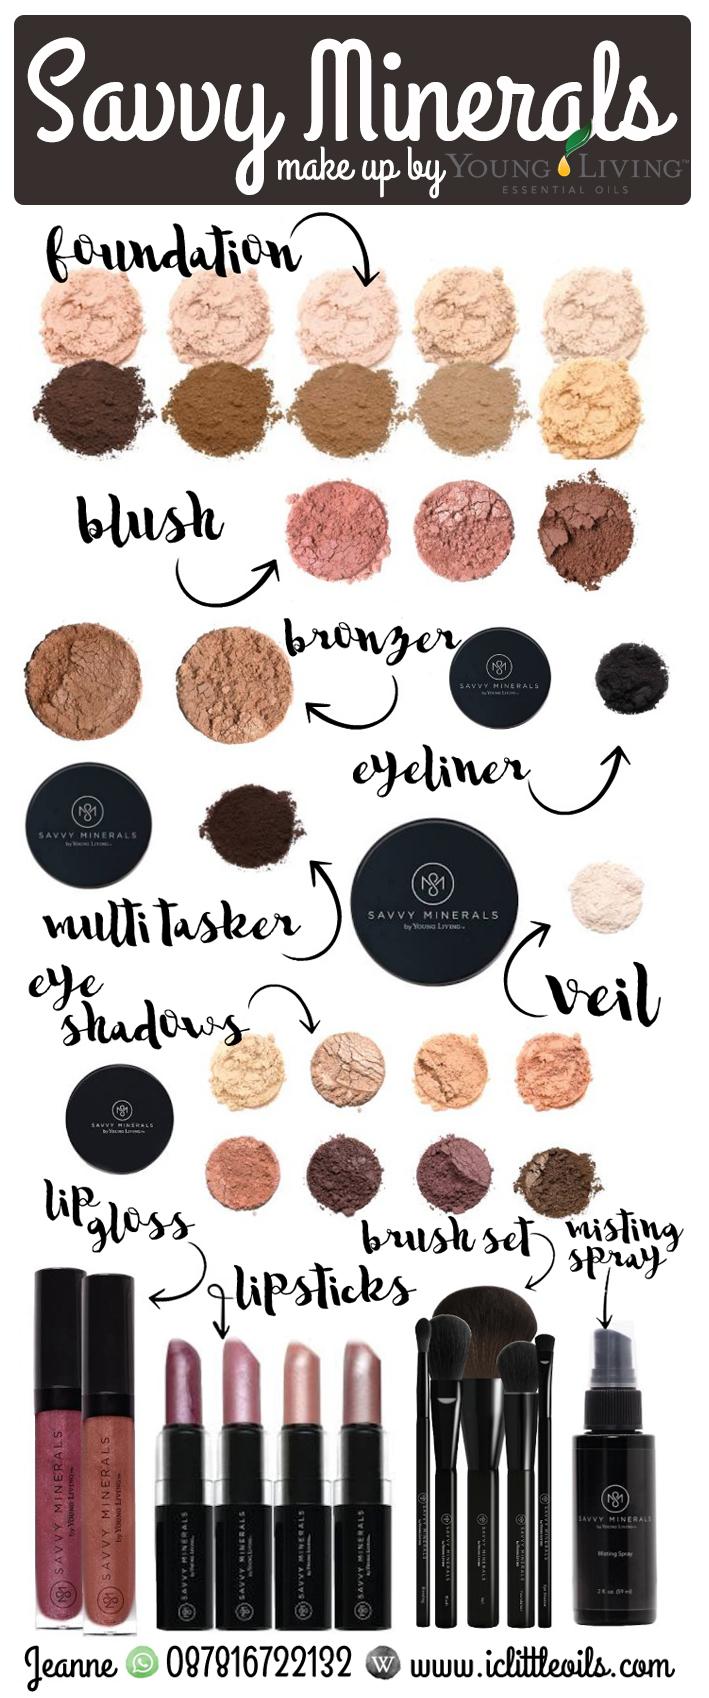 Savvy-Minerals-Makeup1.jpg